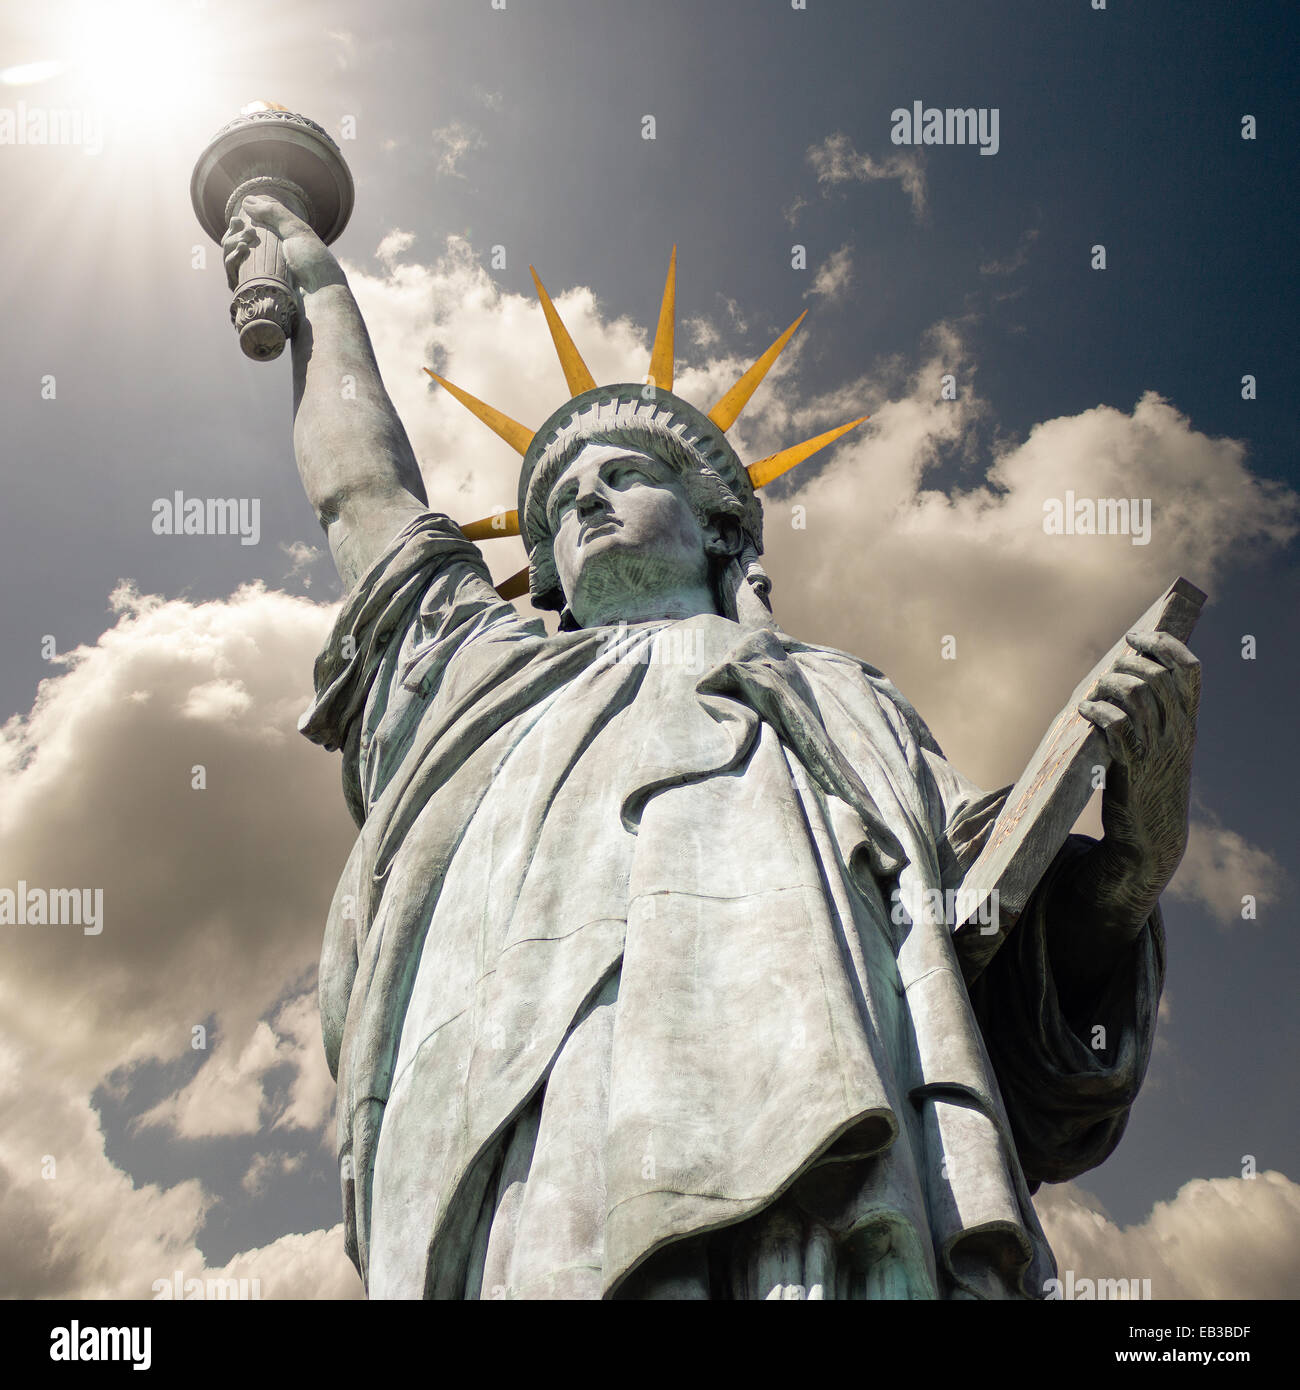 Statue of Liberty, New York, America, USA - Stock Image